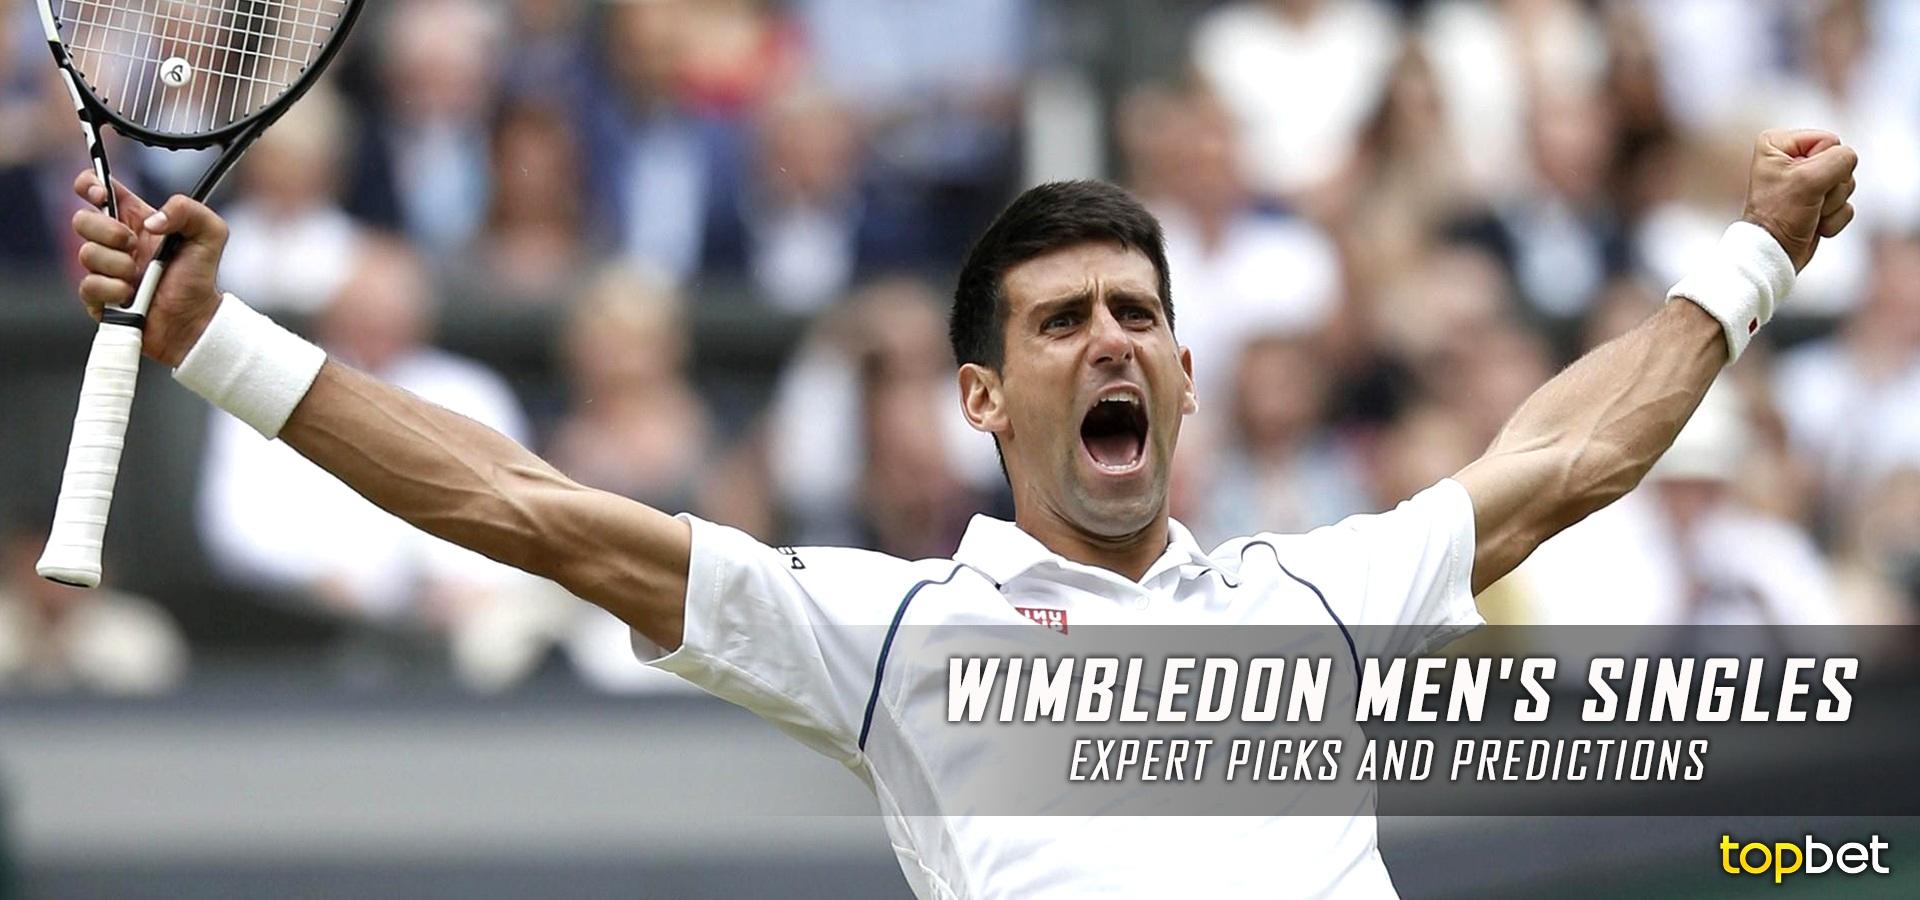 mens singles wimbeldon champion